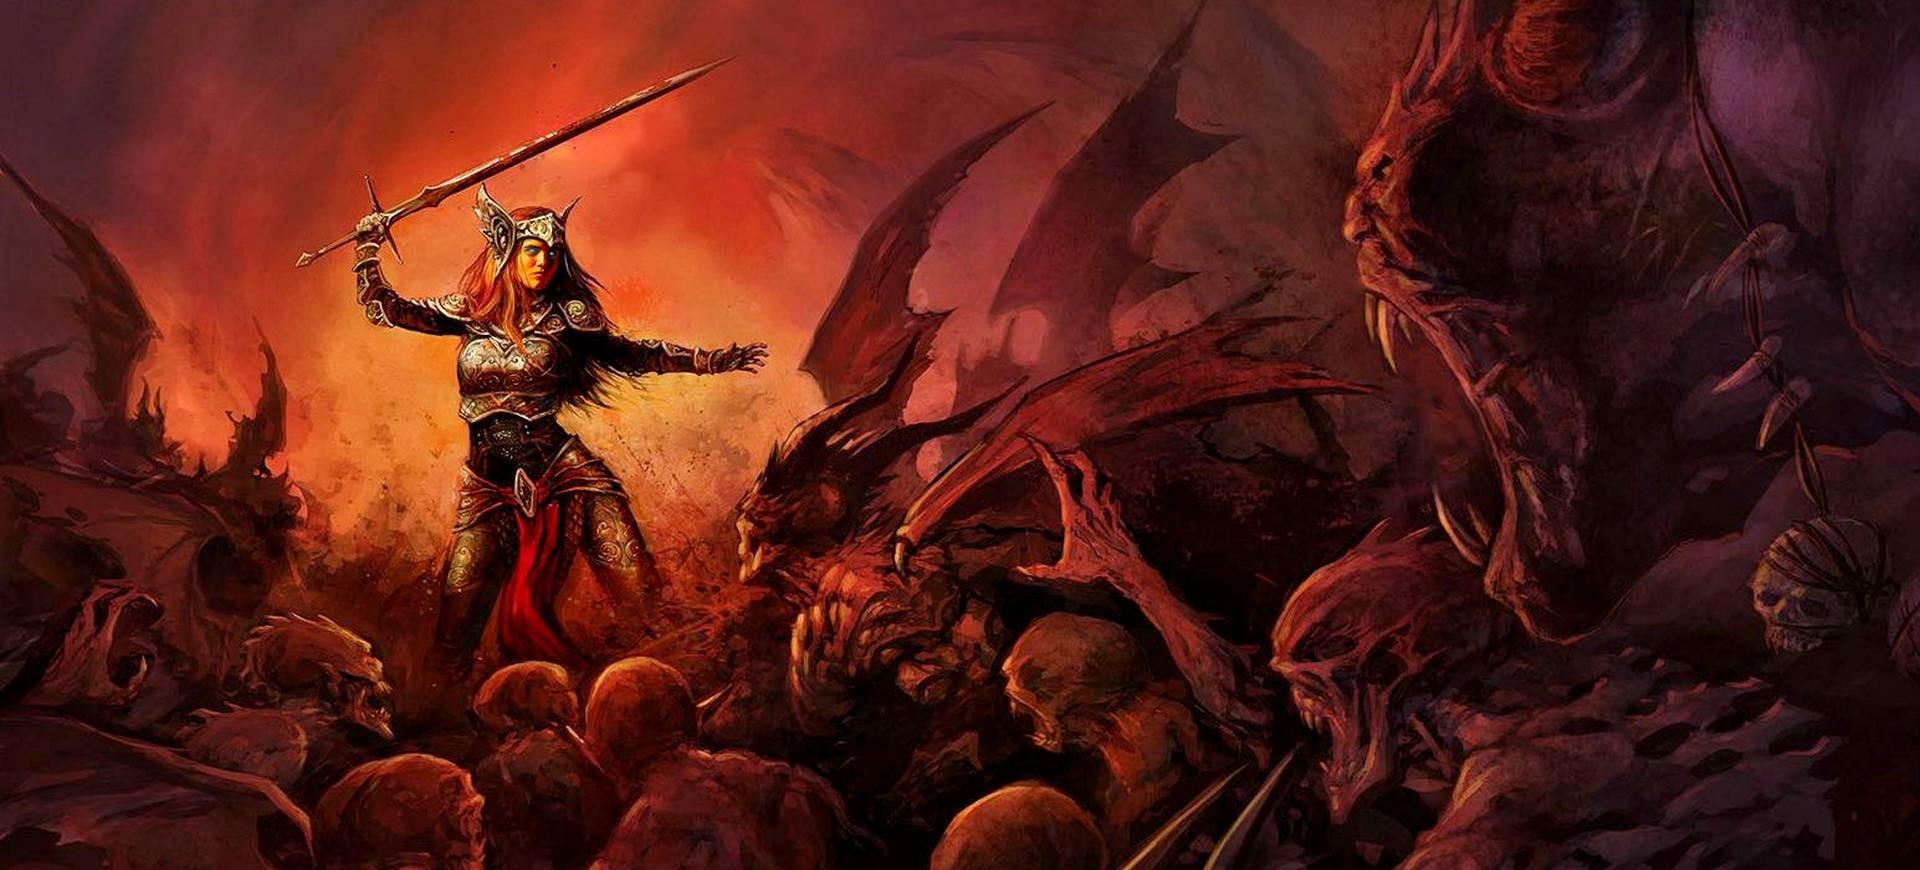 Baldur's Gate: Siege of Dragonspear - Bản hùng ca bi tráng